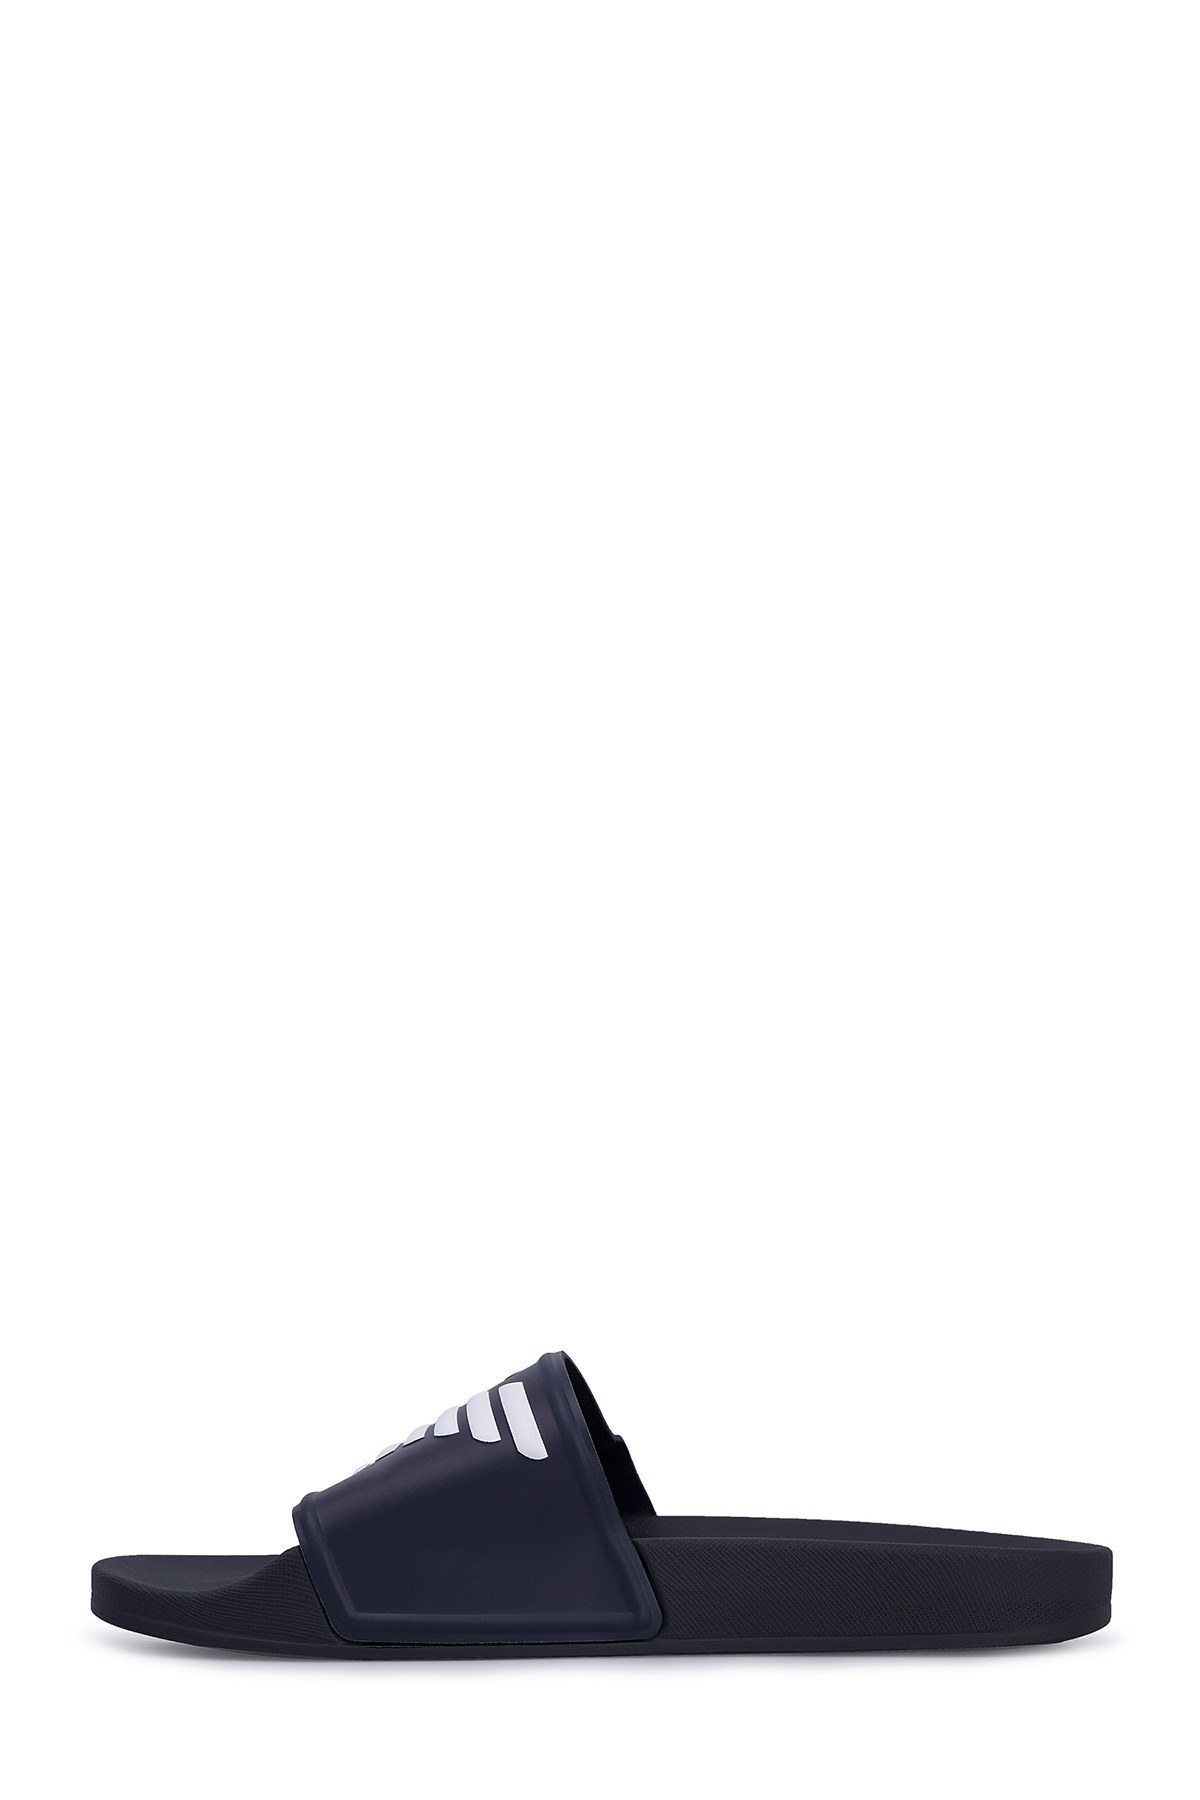 Emporio Armani Kadın Terlik X3PS03 XL828 D813 LACİVERT